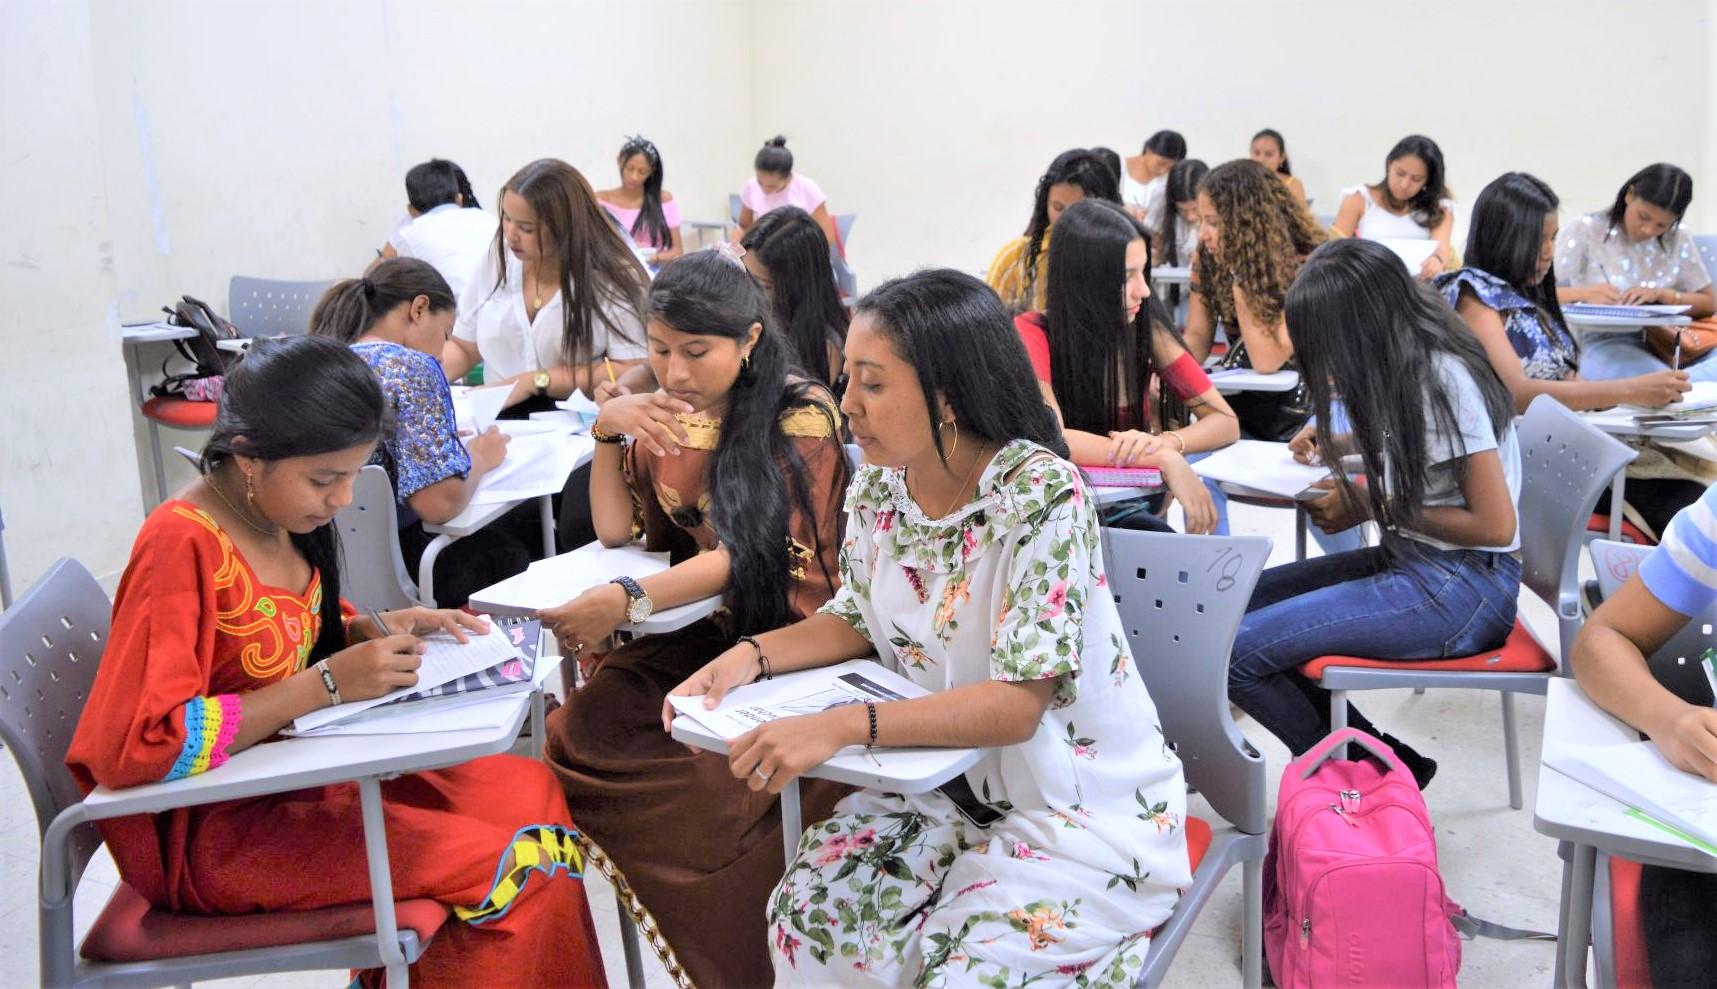 hoyennoticia.com, Uniguajira y CEAP firmaron acuerdo cooperativo